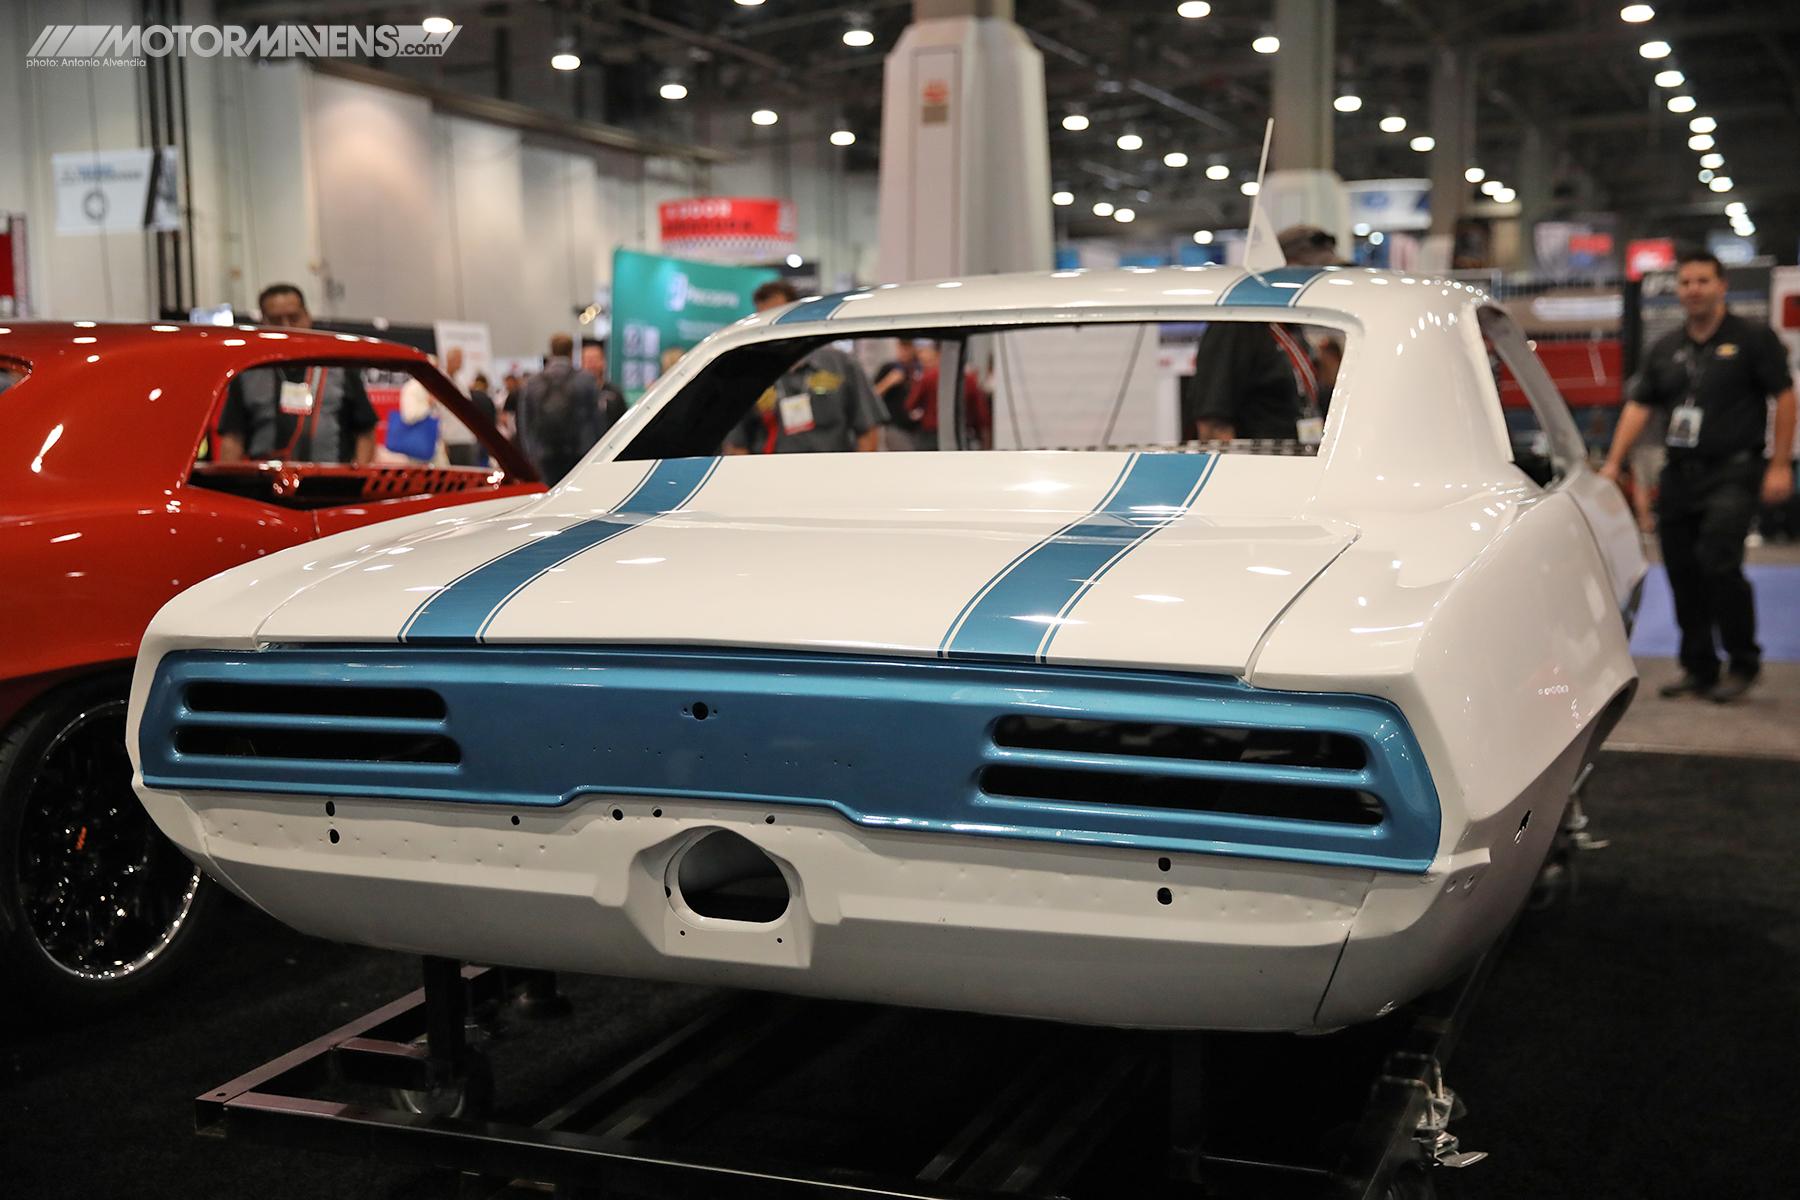 69 Camaro body